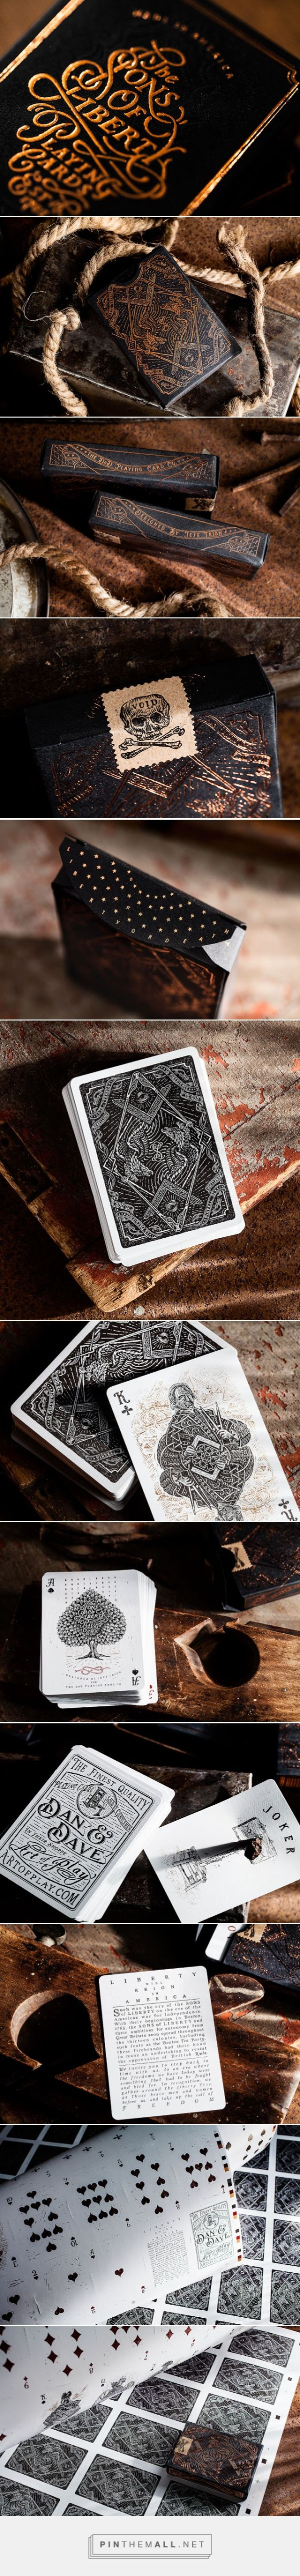 Liberty poker cards